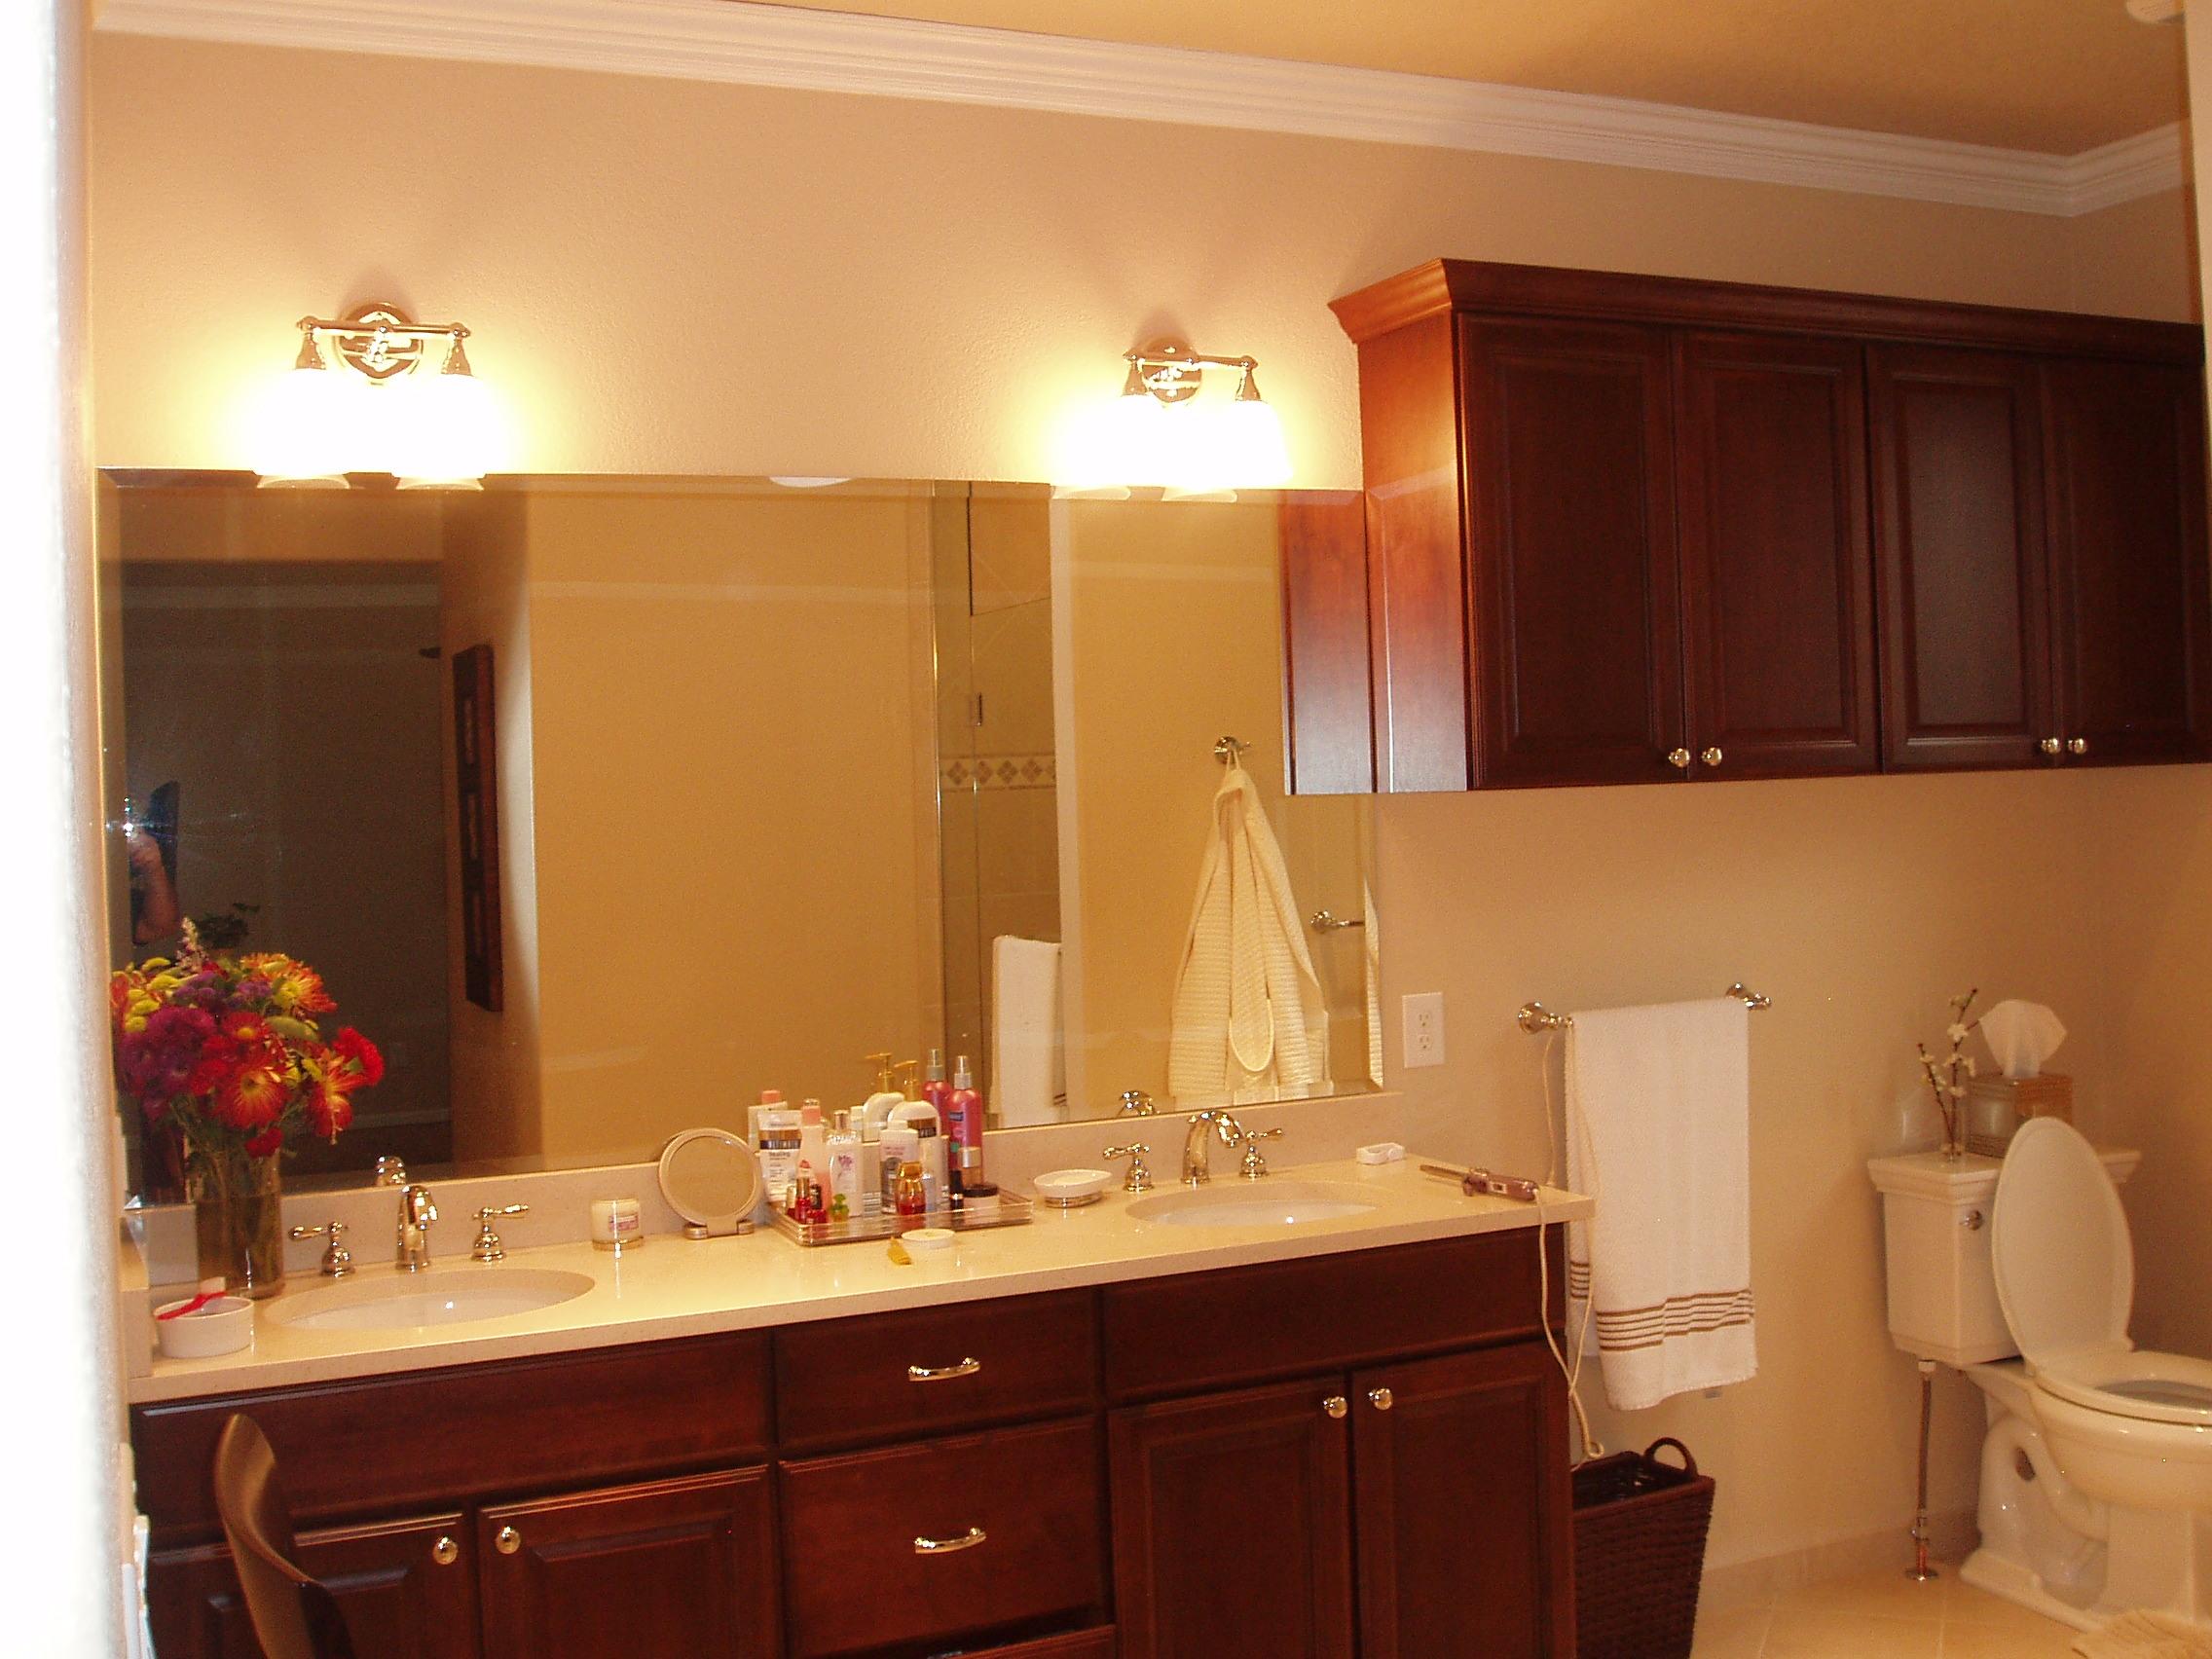 Kitchen Cabinets Winston Salem Nc Bathroom Vanities Winston Salem Nc Marble Top Vanity Set